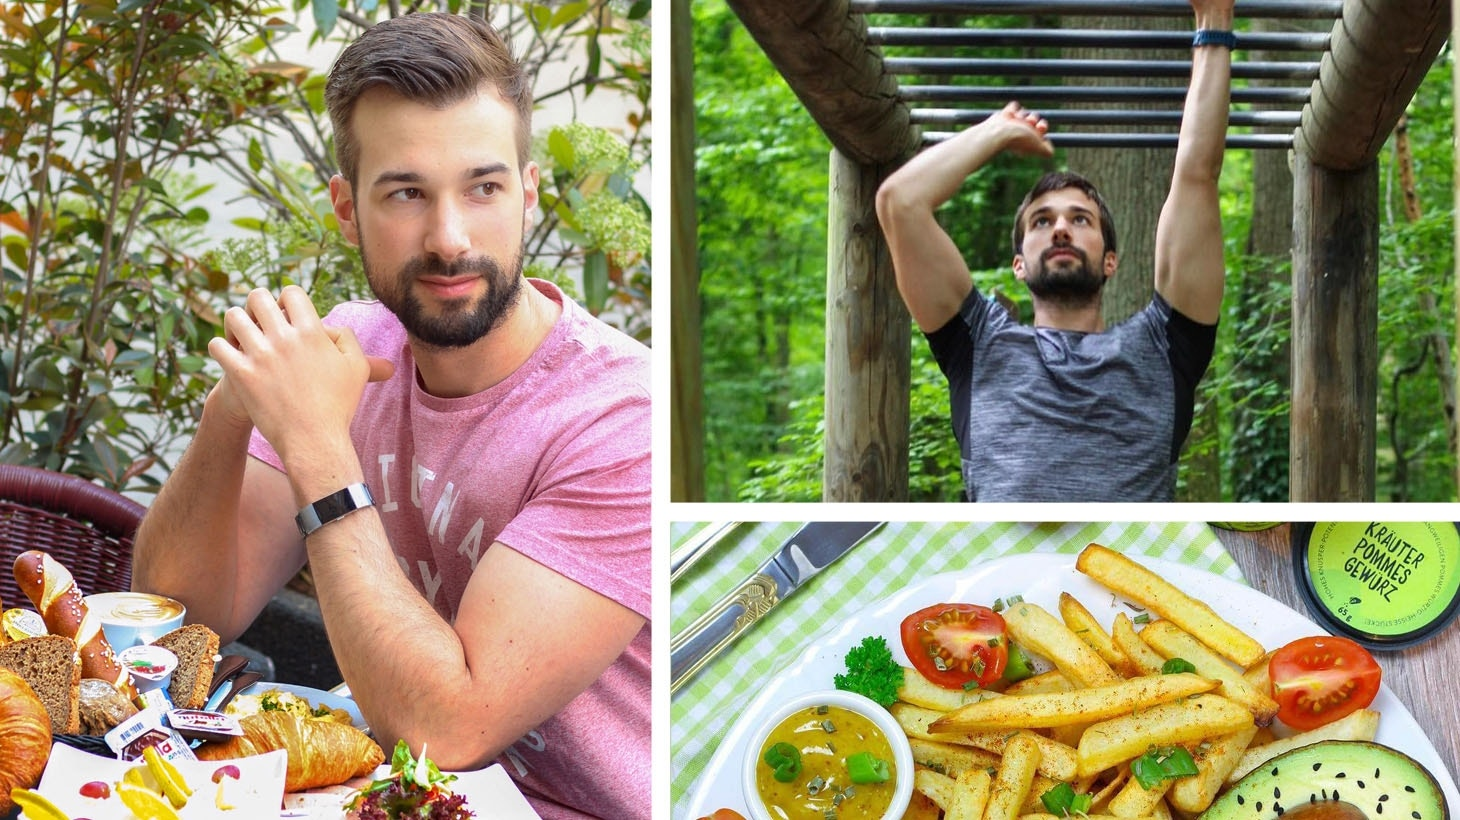 Marco aka marco_fitfood: Sportskanone und Küchenheld